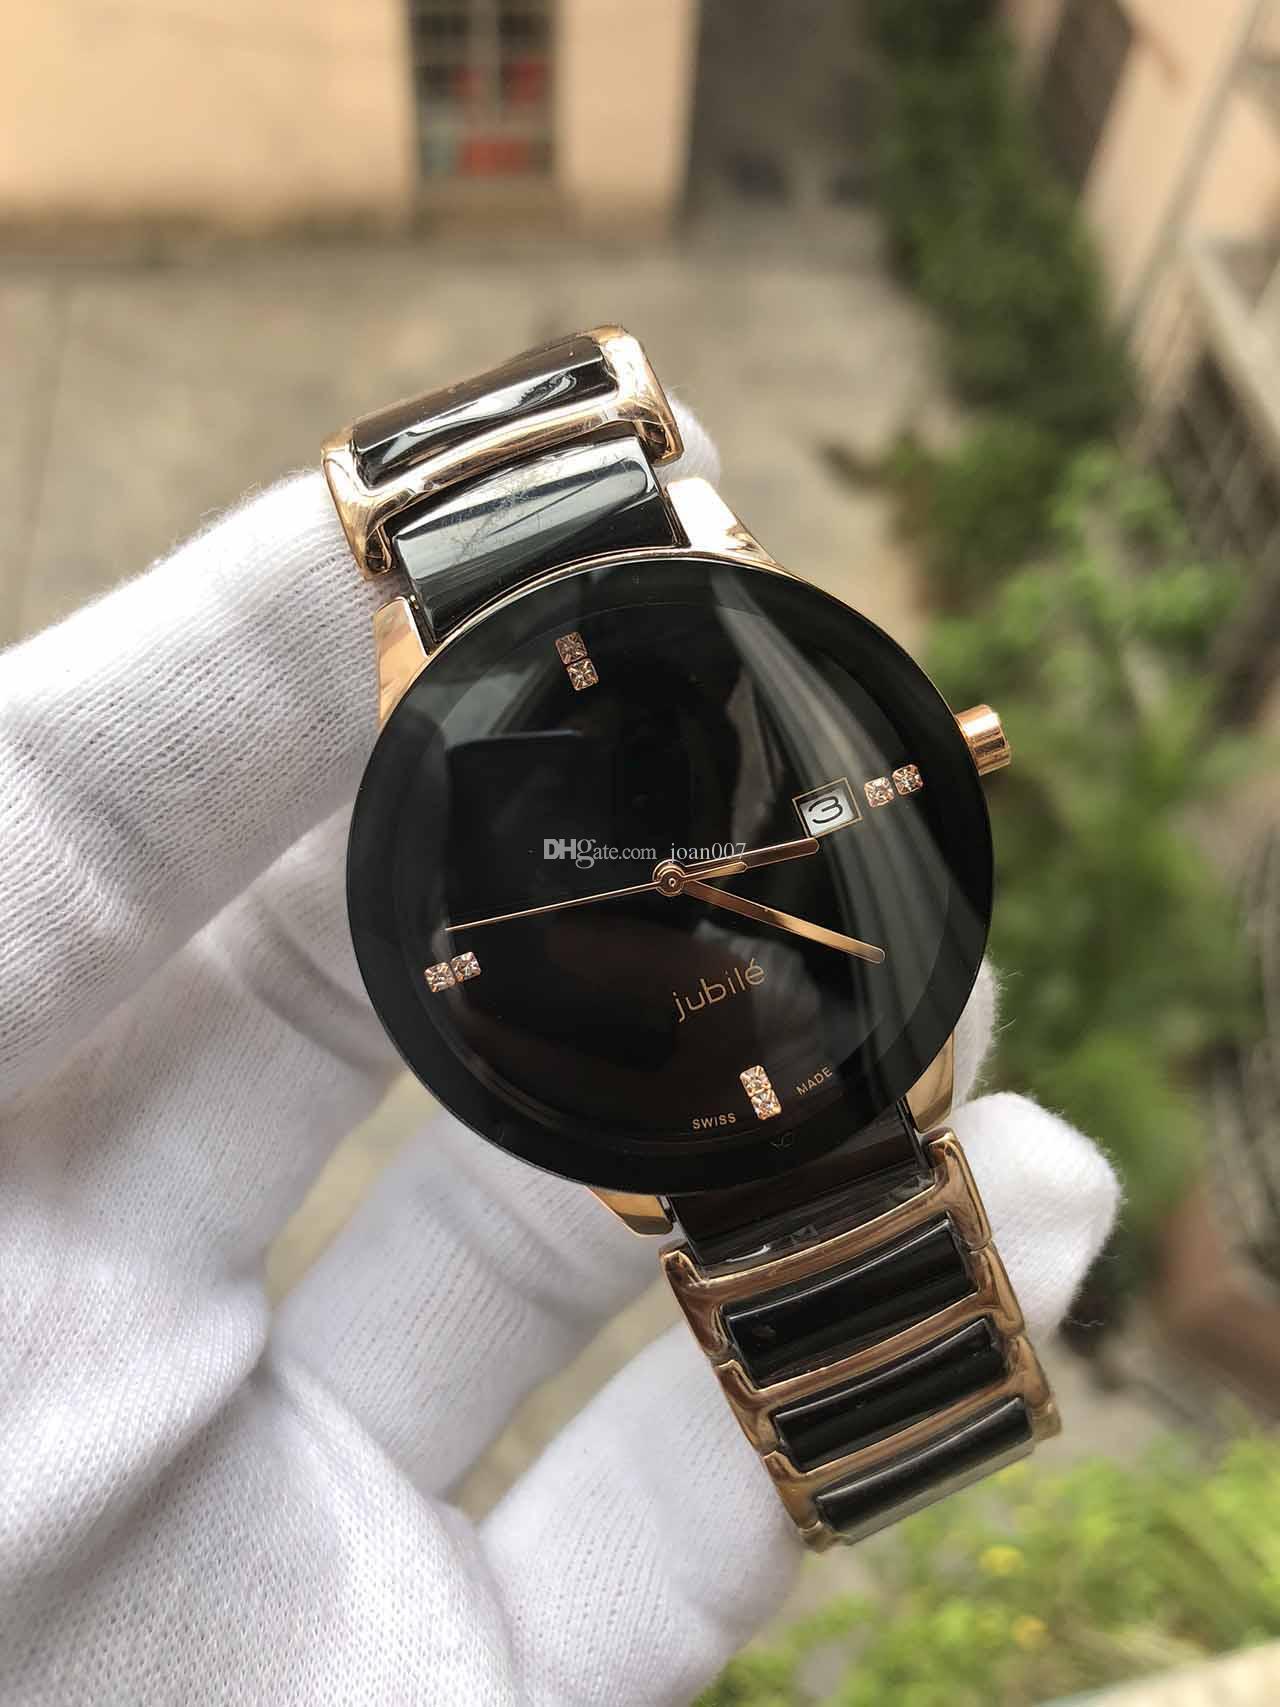 b725d4b01ca8 Unisex Luxury Watches Lady Famous Brand Modern Men S Qaurtz Fashion Black  Ceramic Watch Ladies Casual Designer Mens Sport Watch 37mm Sport Watches  Online ...